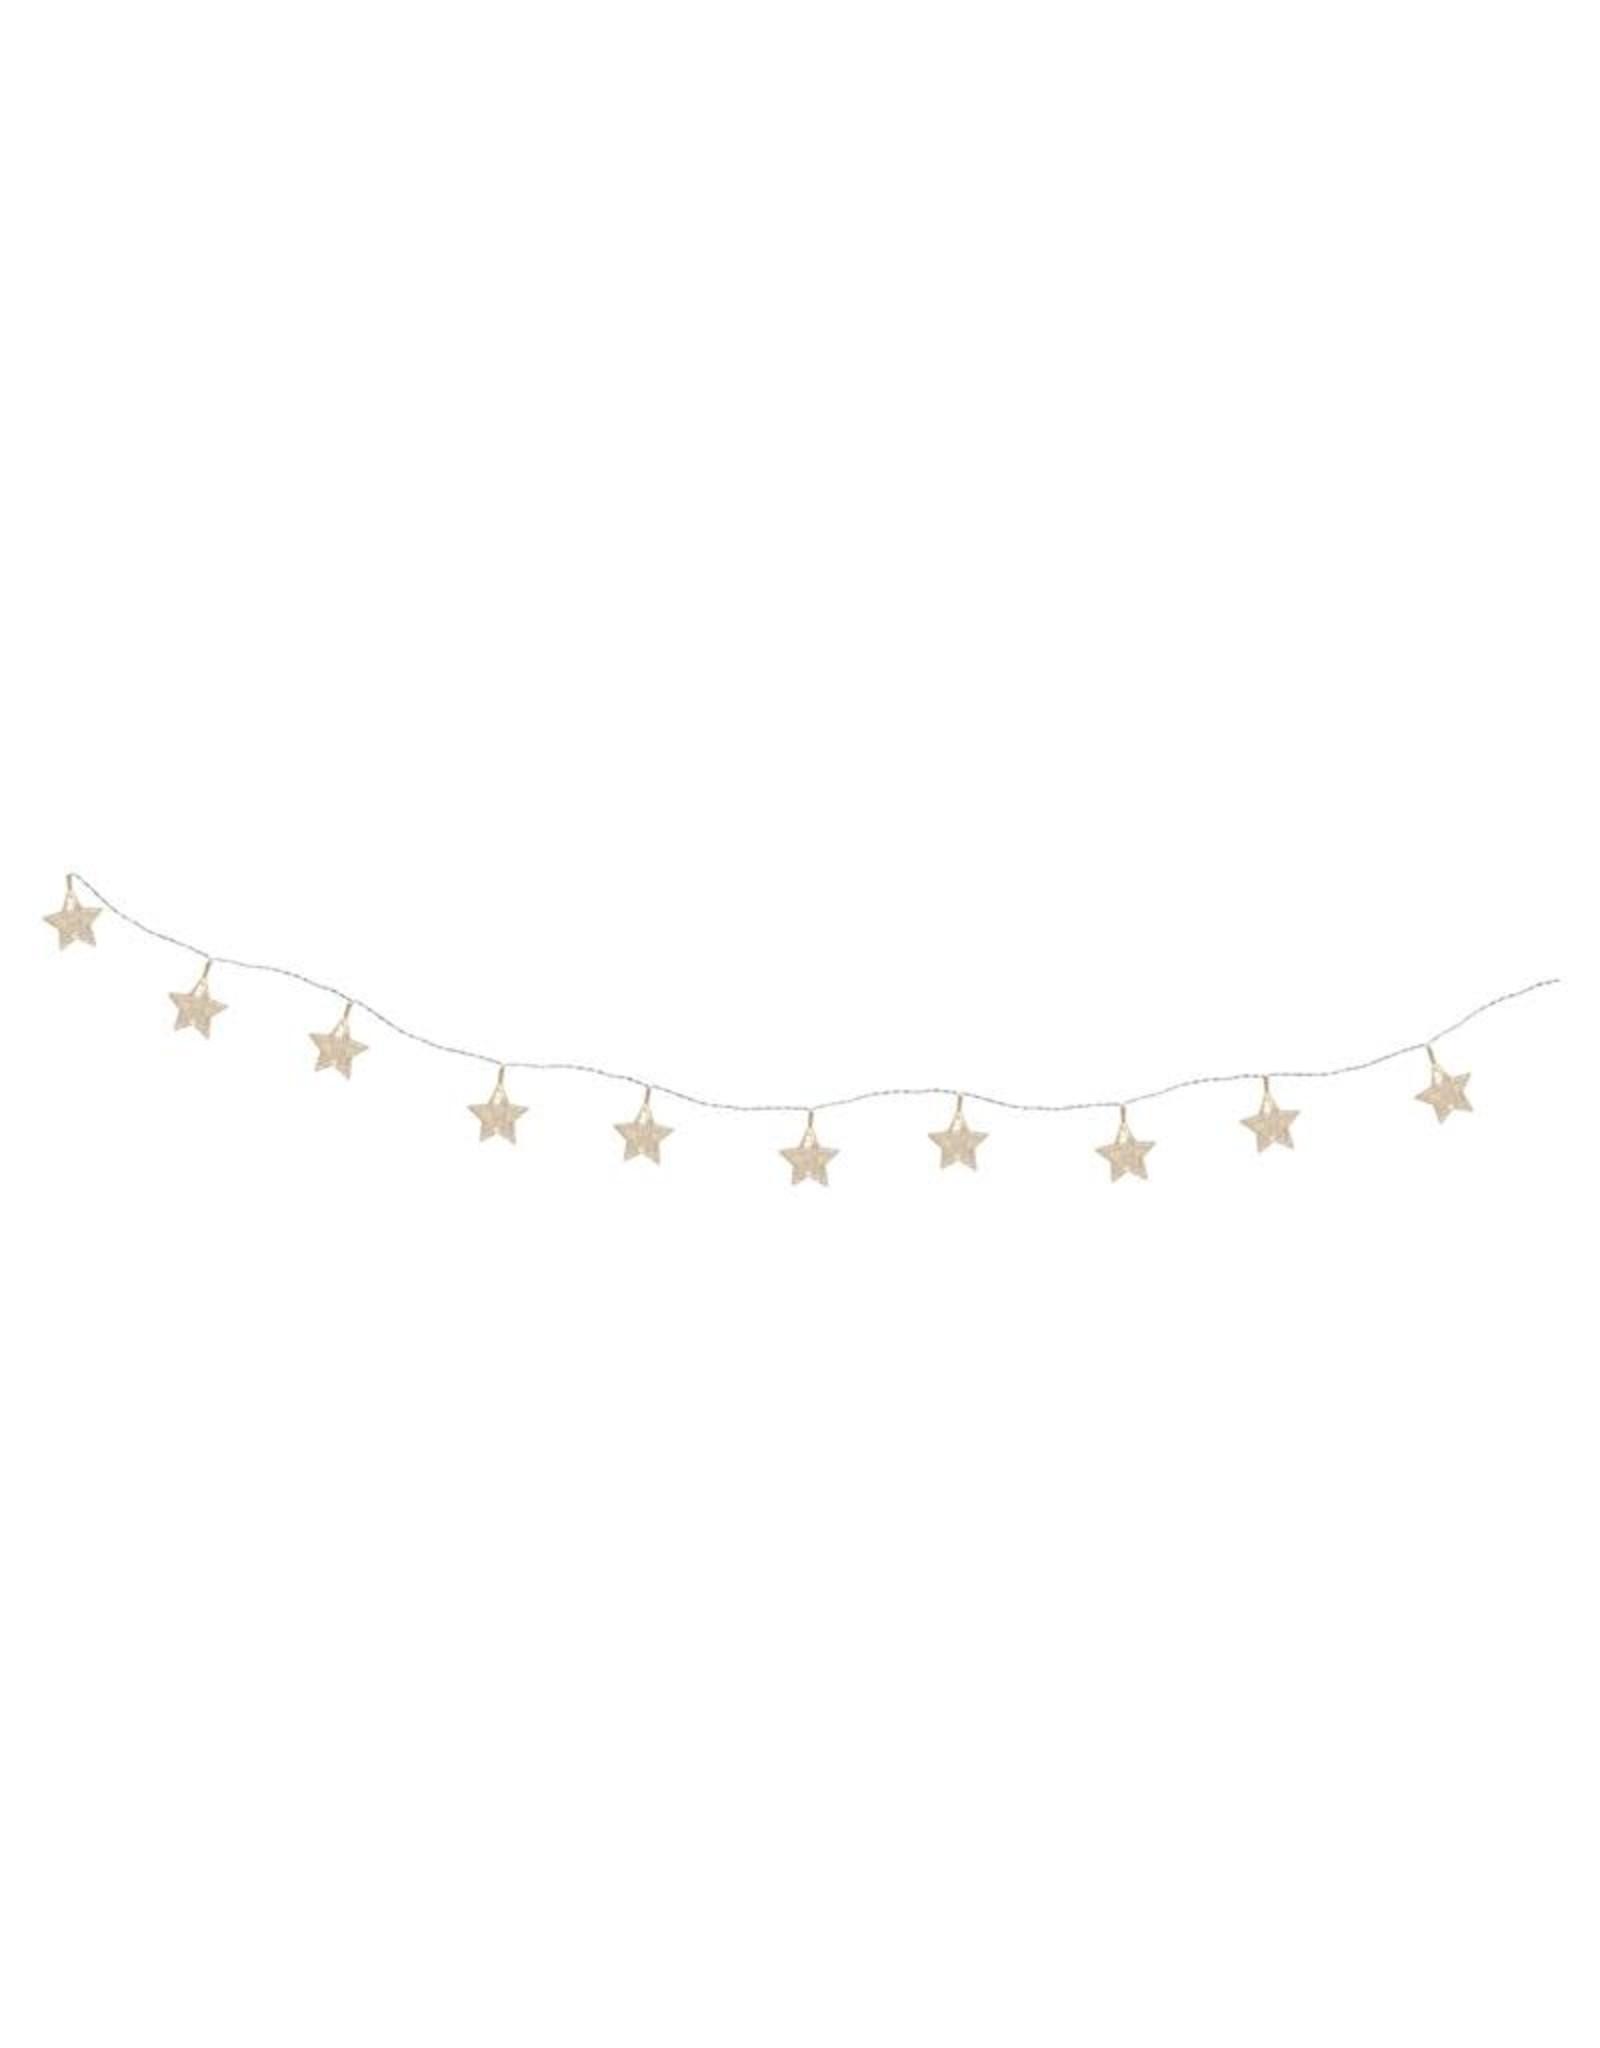 Le Studio card clips light string - stars